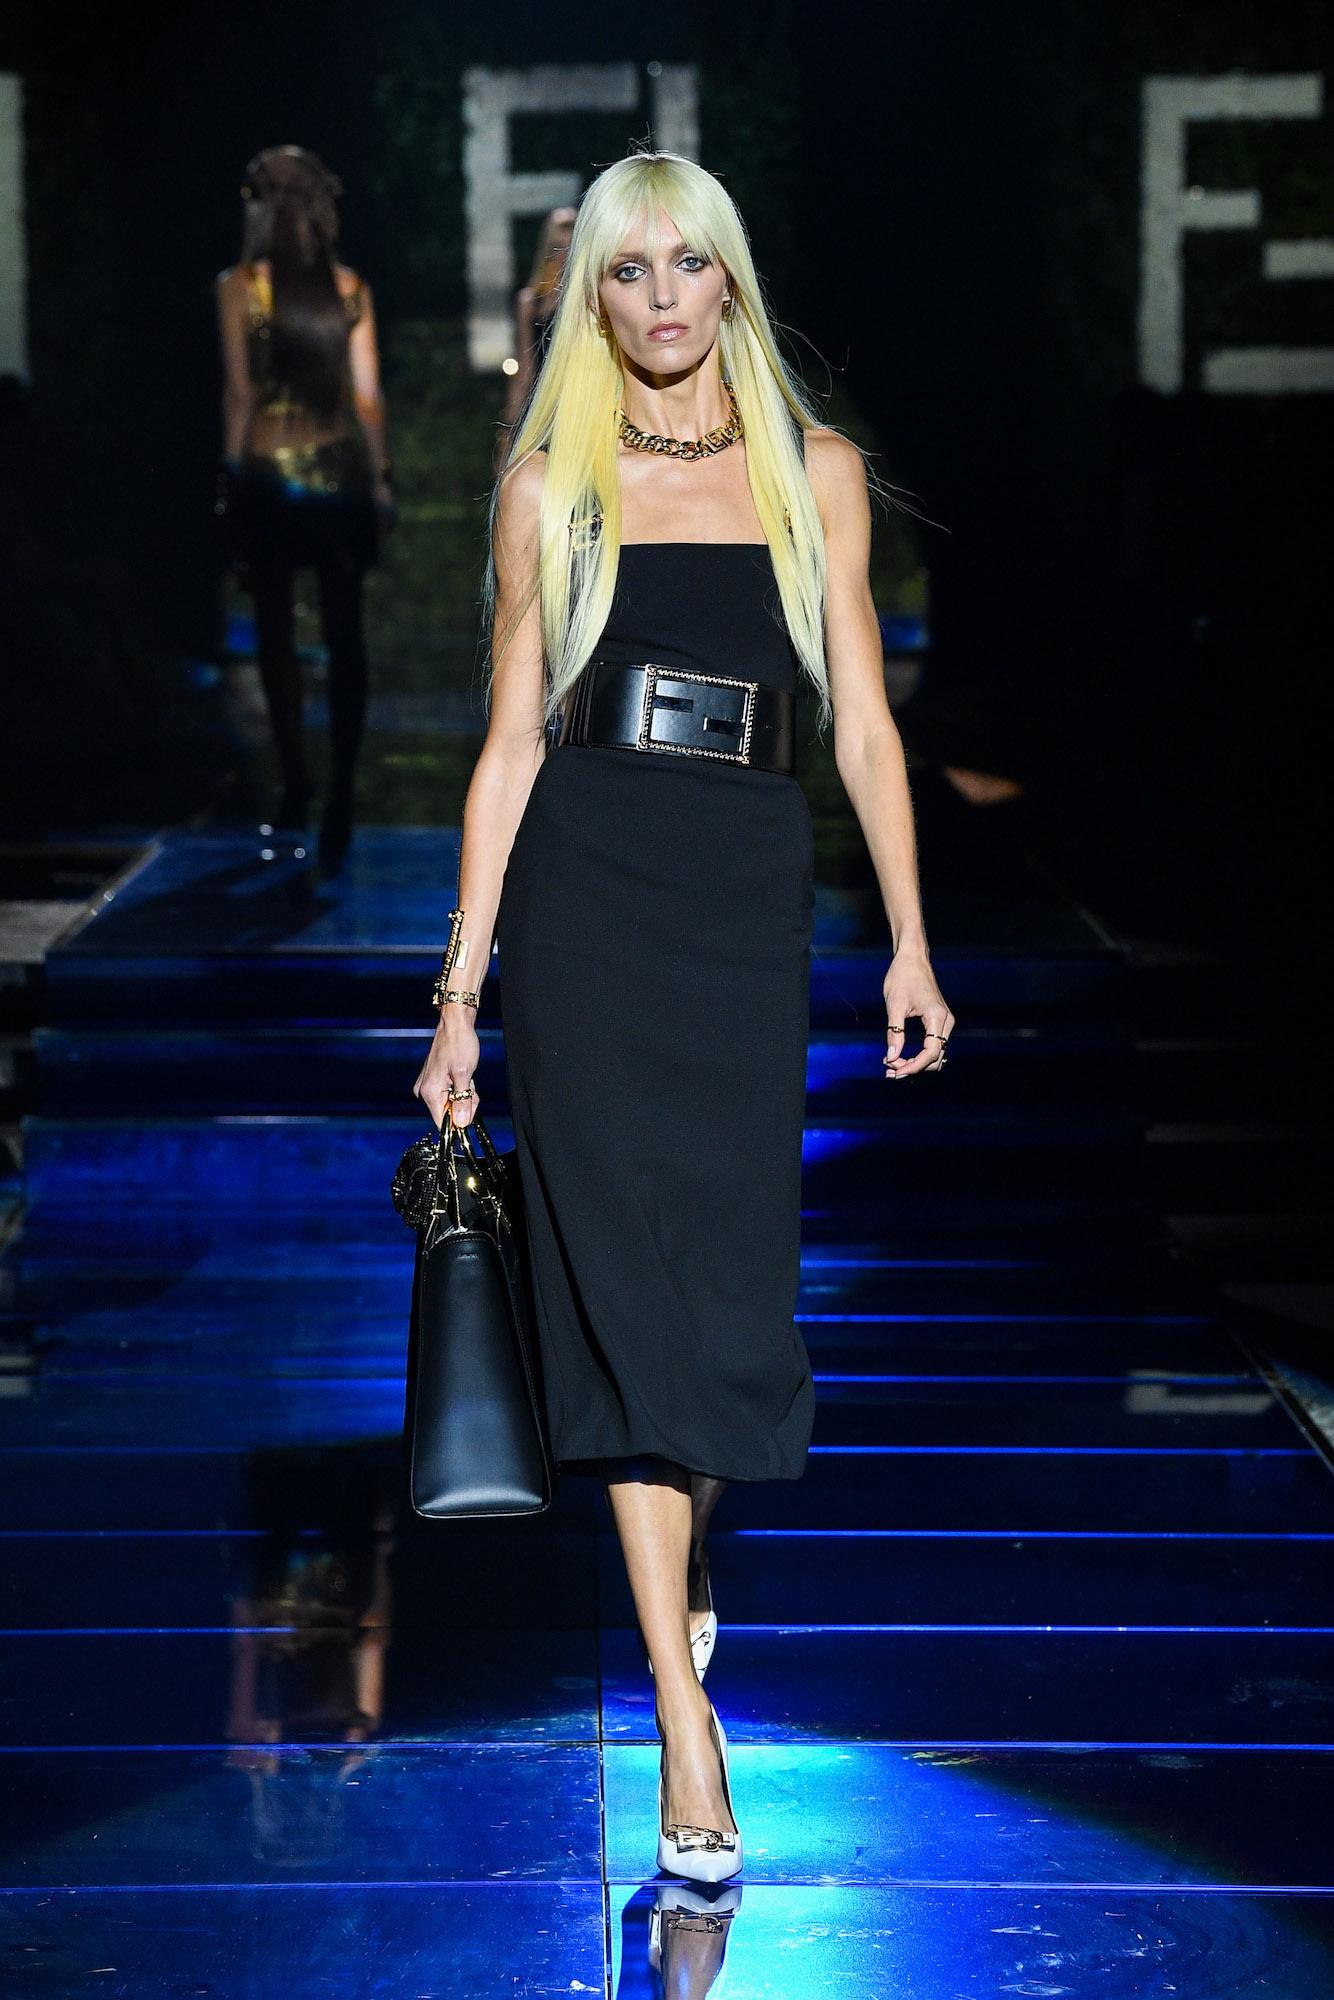 fendi by versace (18)